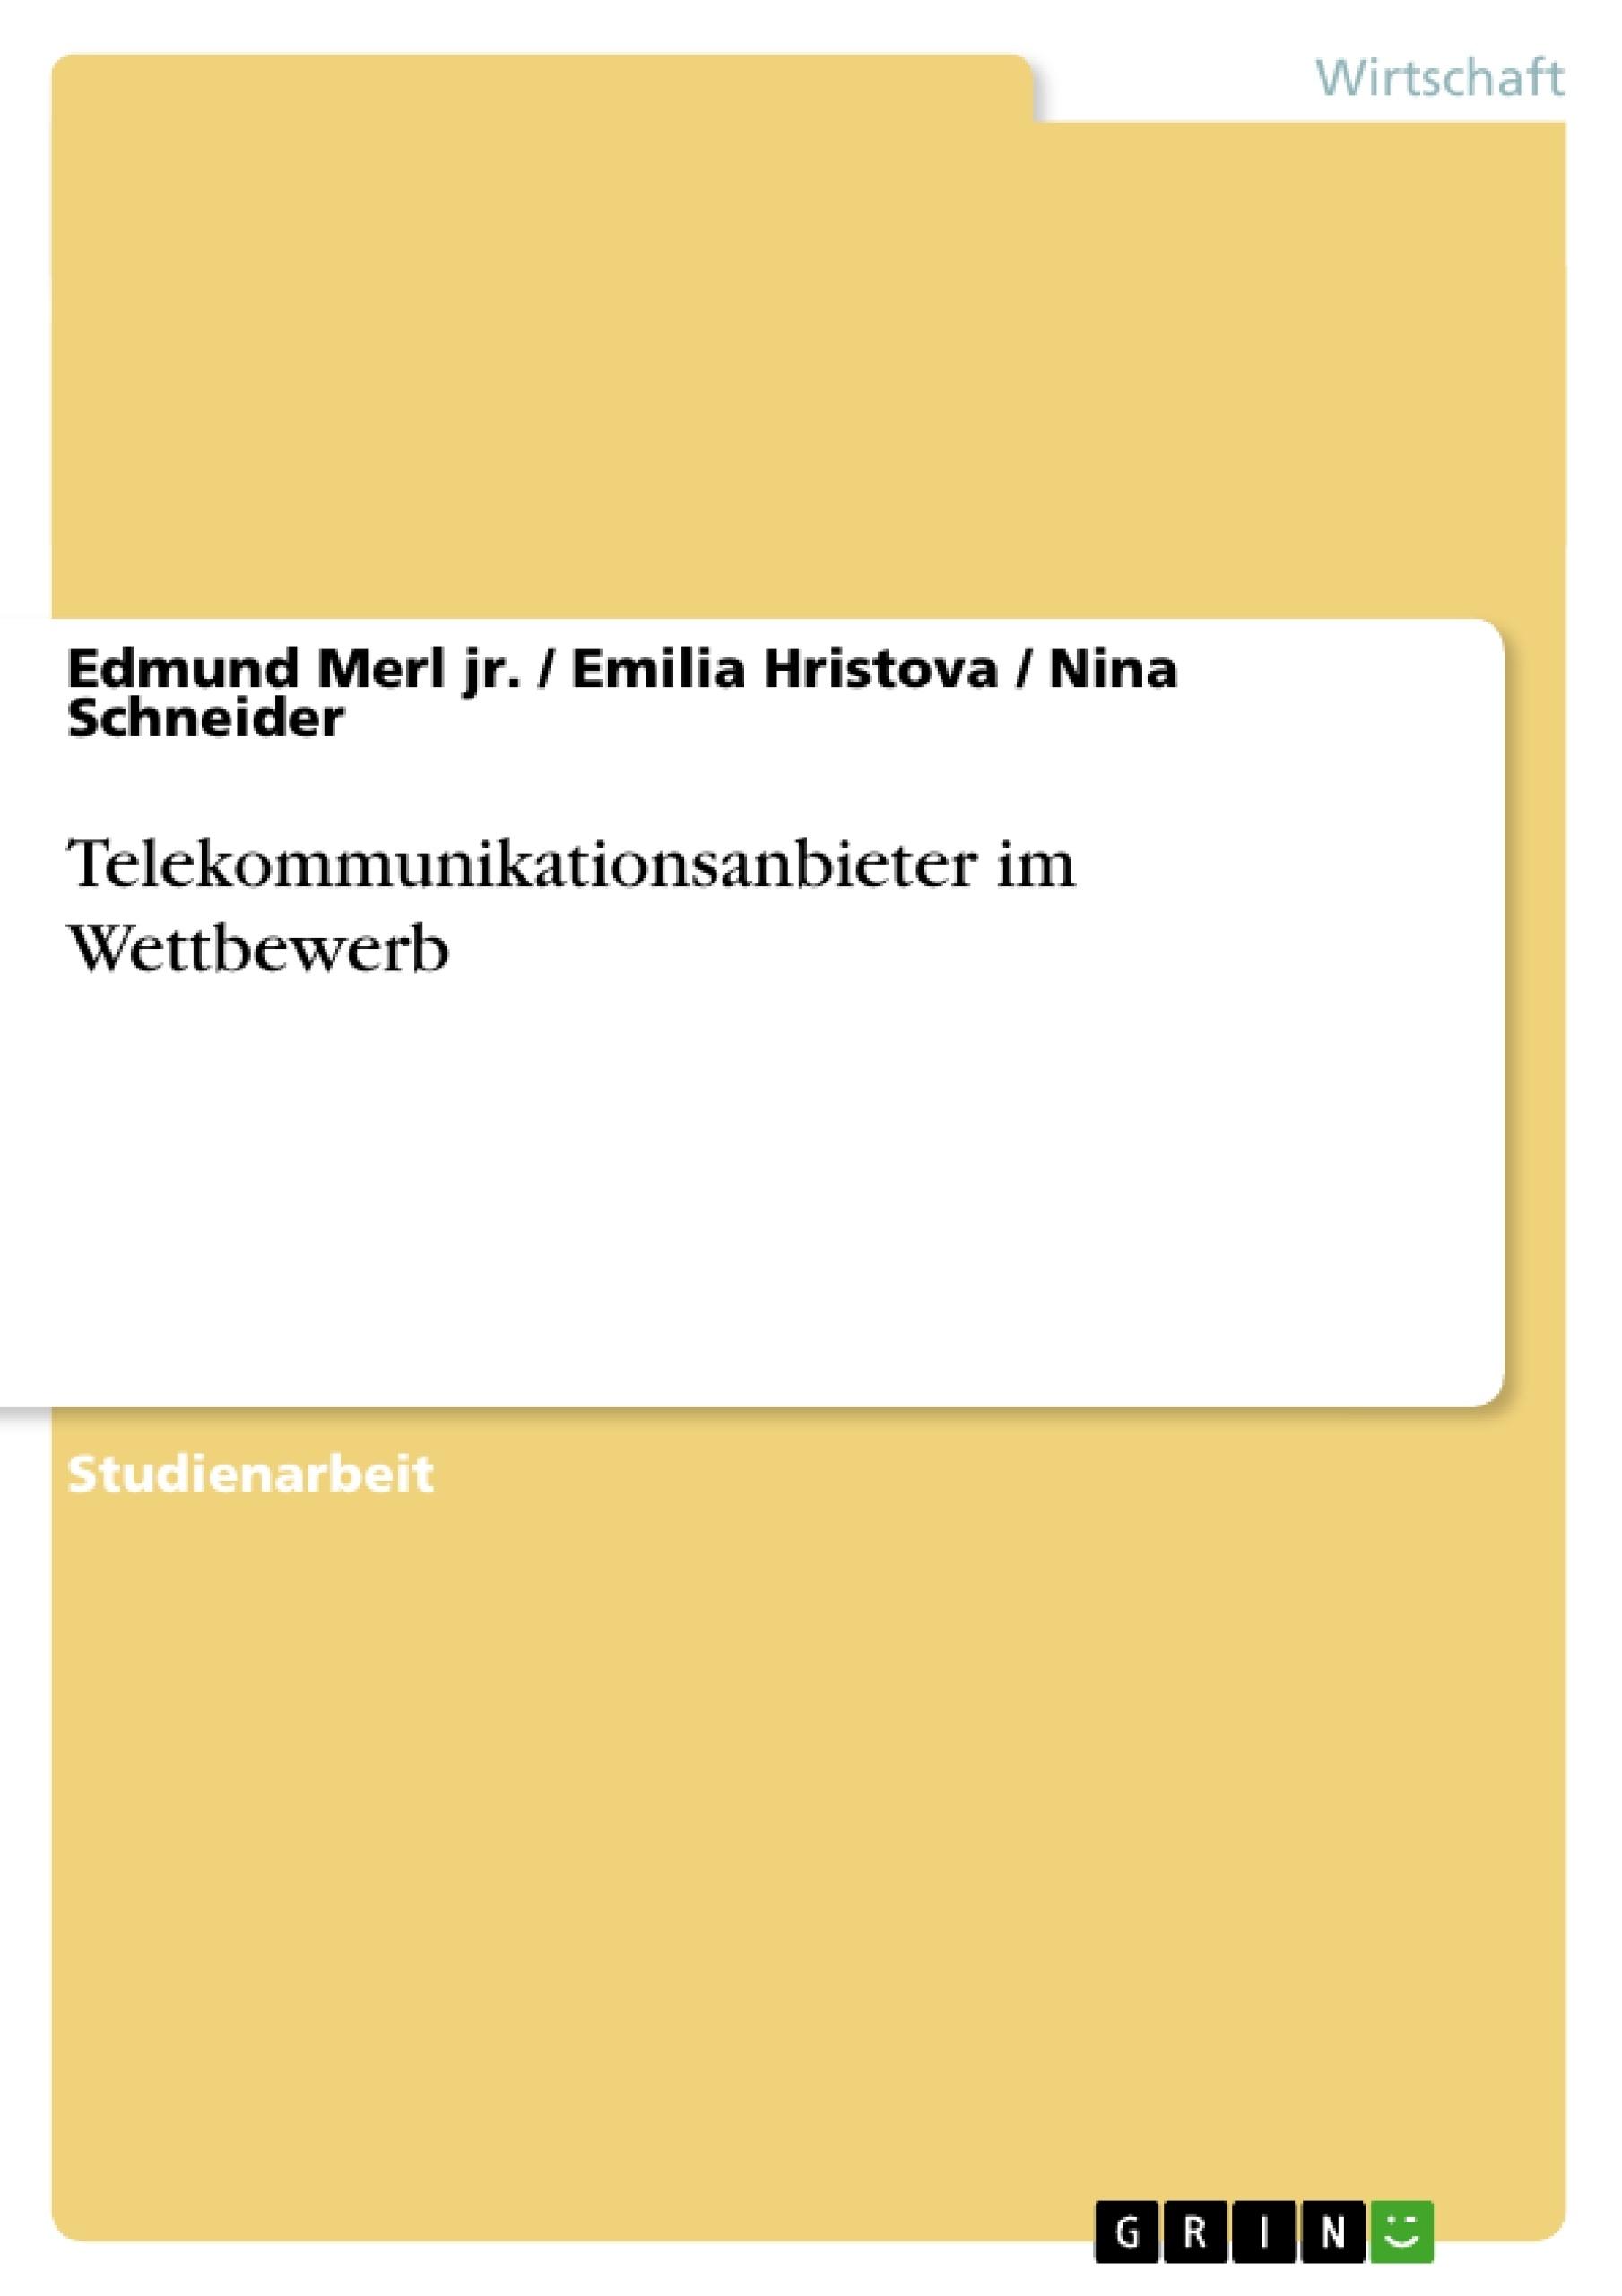 Titel: Telekommunikationsanbieter im Wettbewerb